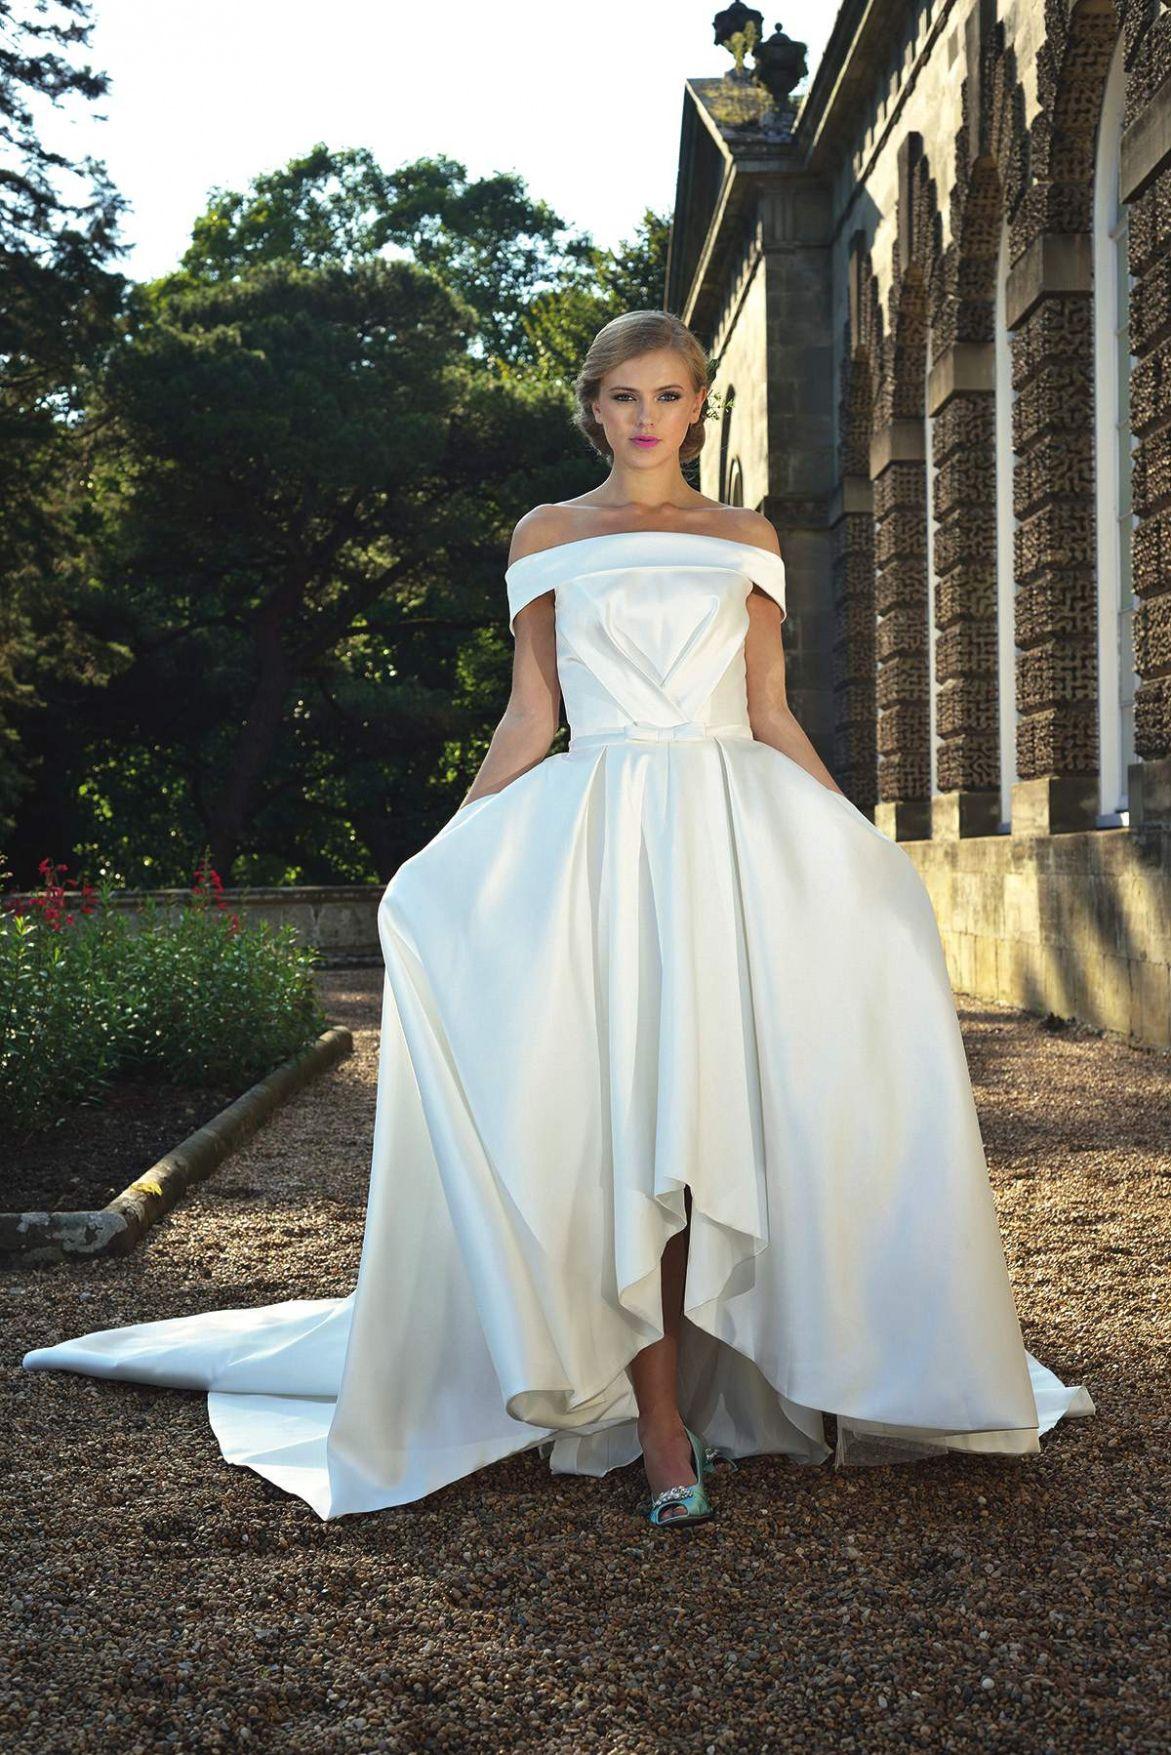 Pin by mmarita on bryllup pinterest wedding dresses dresses and